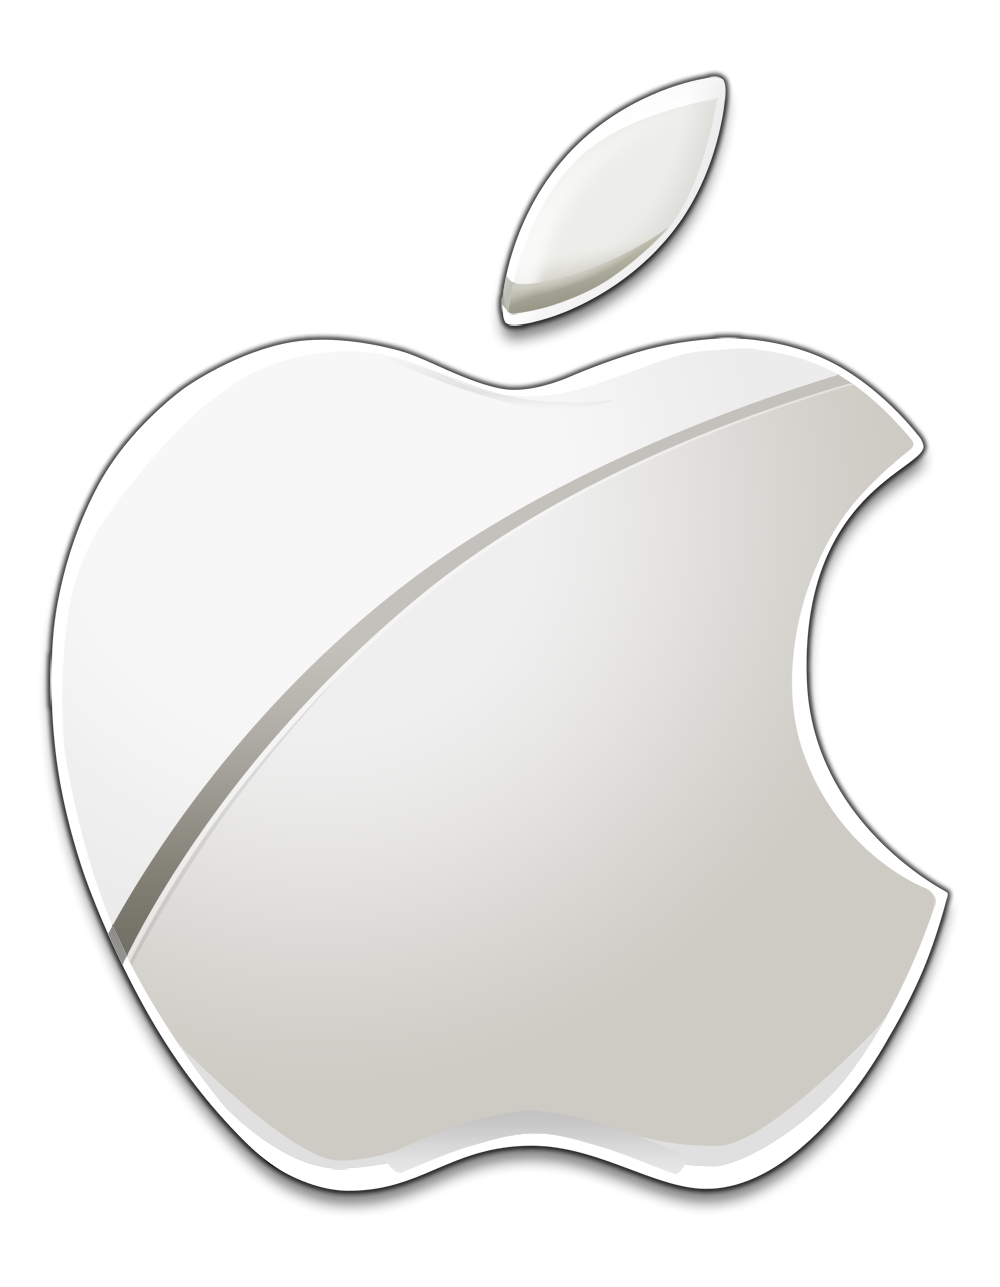 White Apple Logo Apple Logo Apple Brand Apple Products